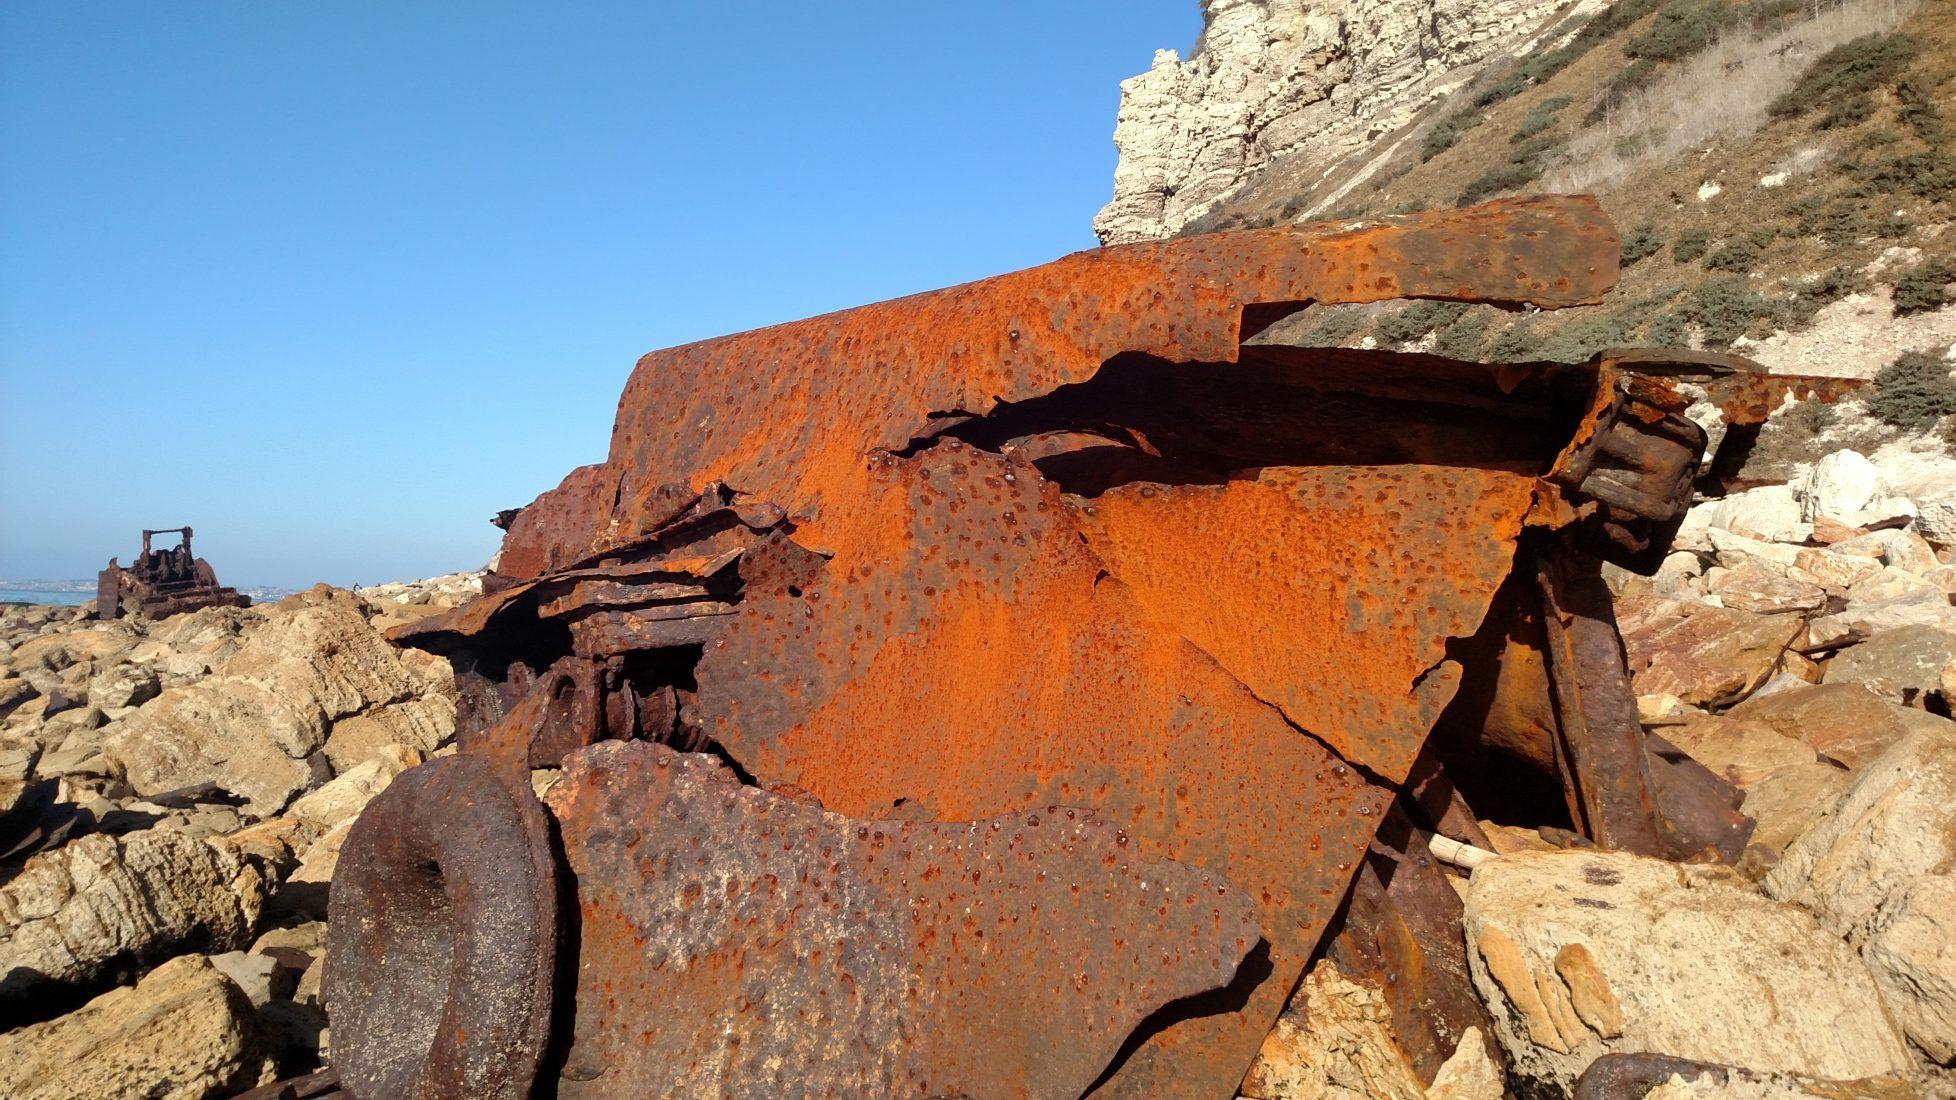 SS Dominator Shipwreck, Palos Verdes Peninsula, CA